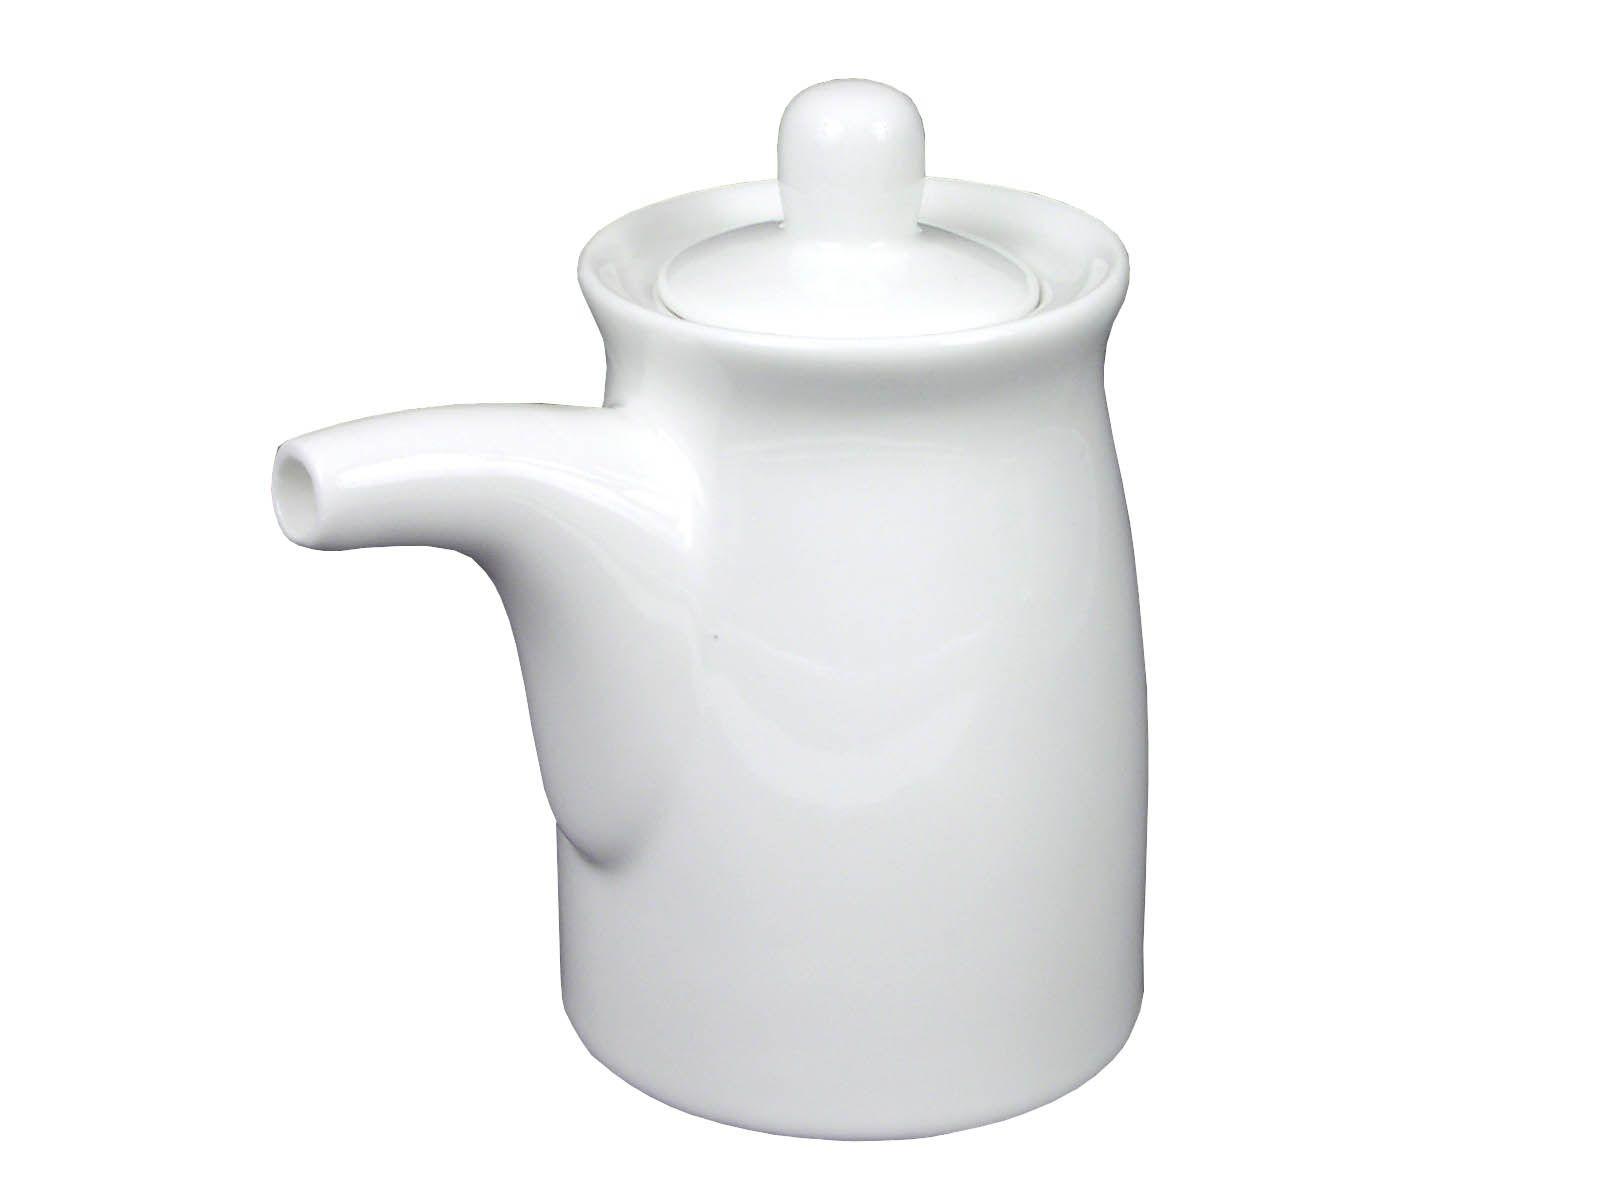 Simply White Sauce Dispenser White Ceramics Condiment Sets Ceramics